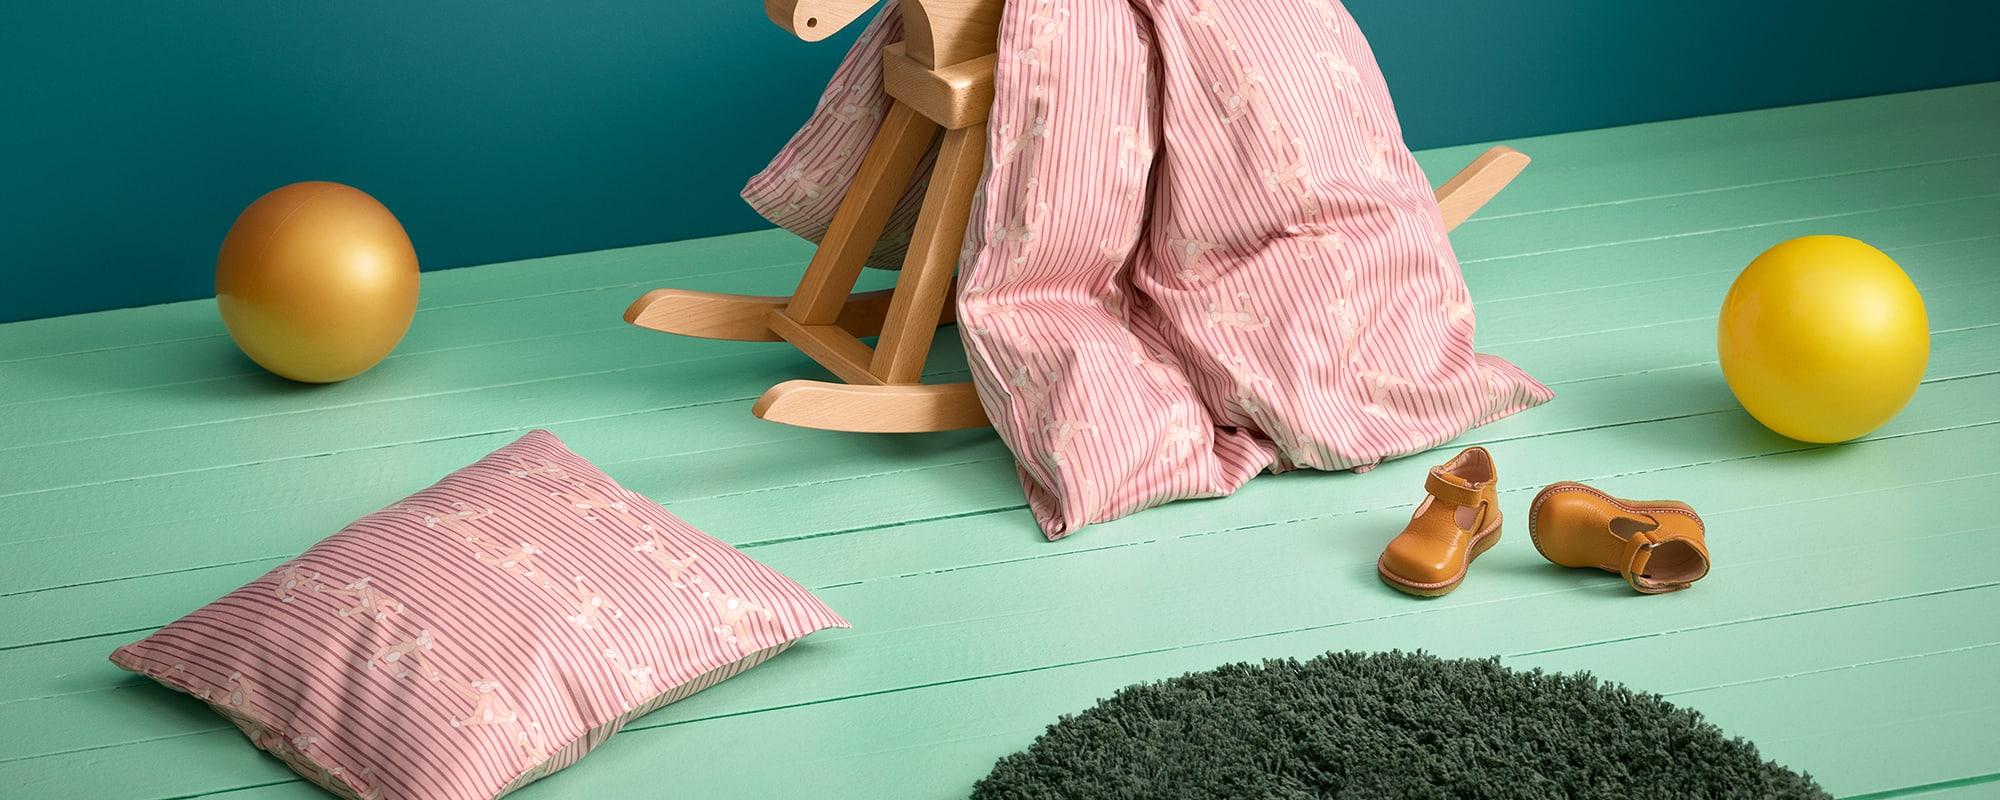 AD, Design, Produkt, Kinderzimmer, Spielzeug, Textilien, News, Kay Bojesen, Babies